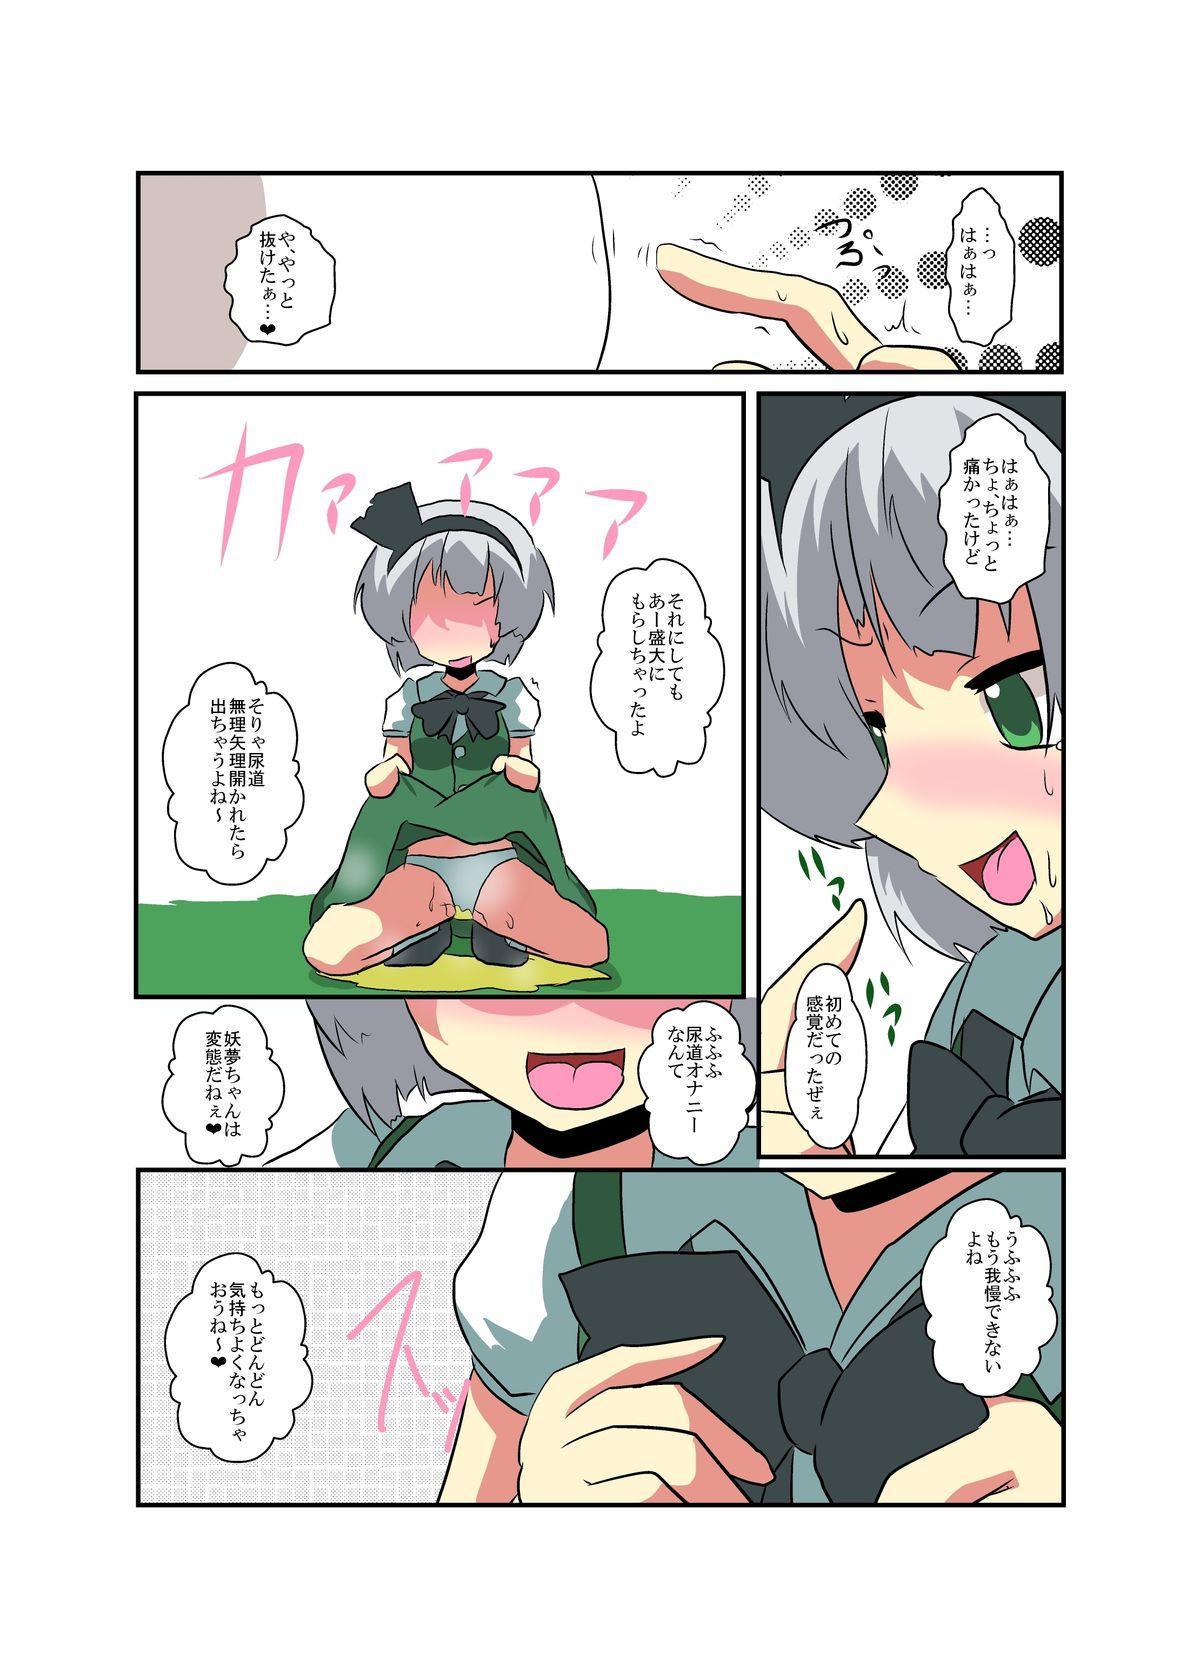 Touhou TS monogatari 10